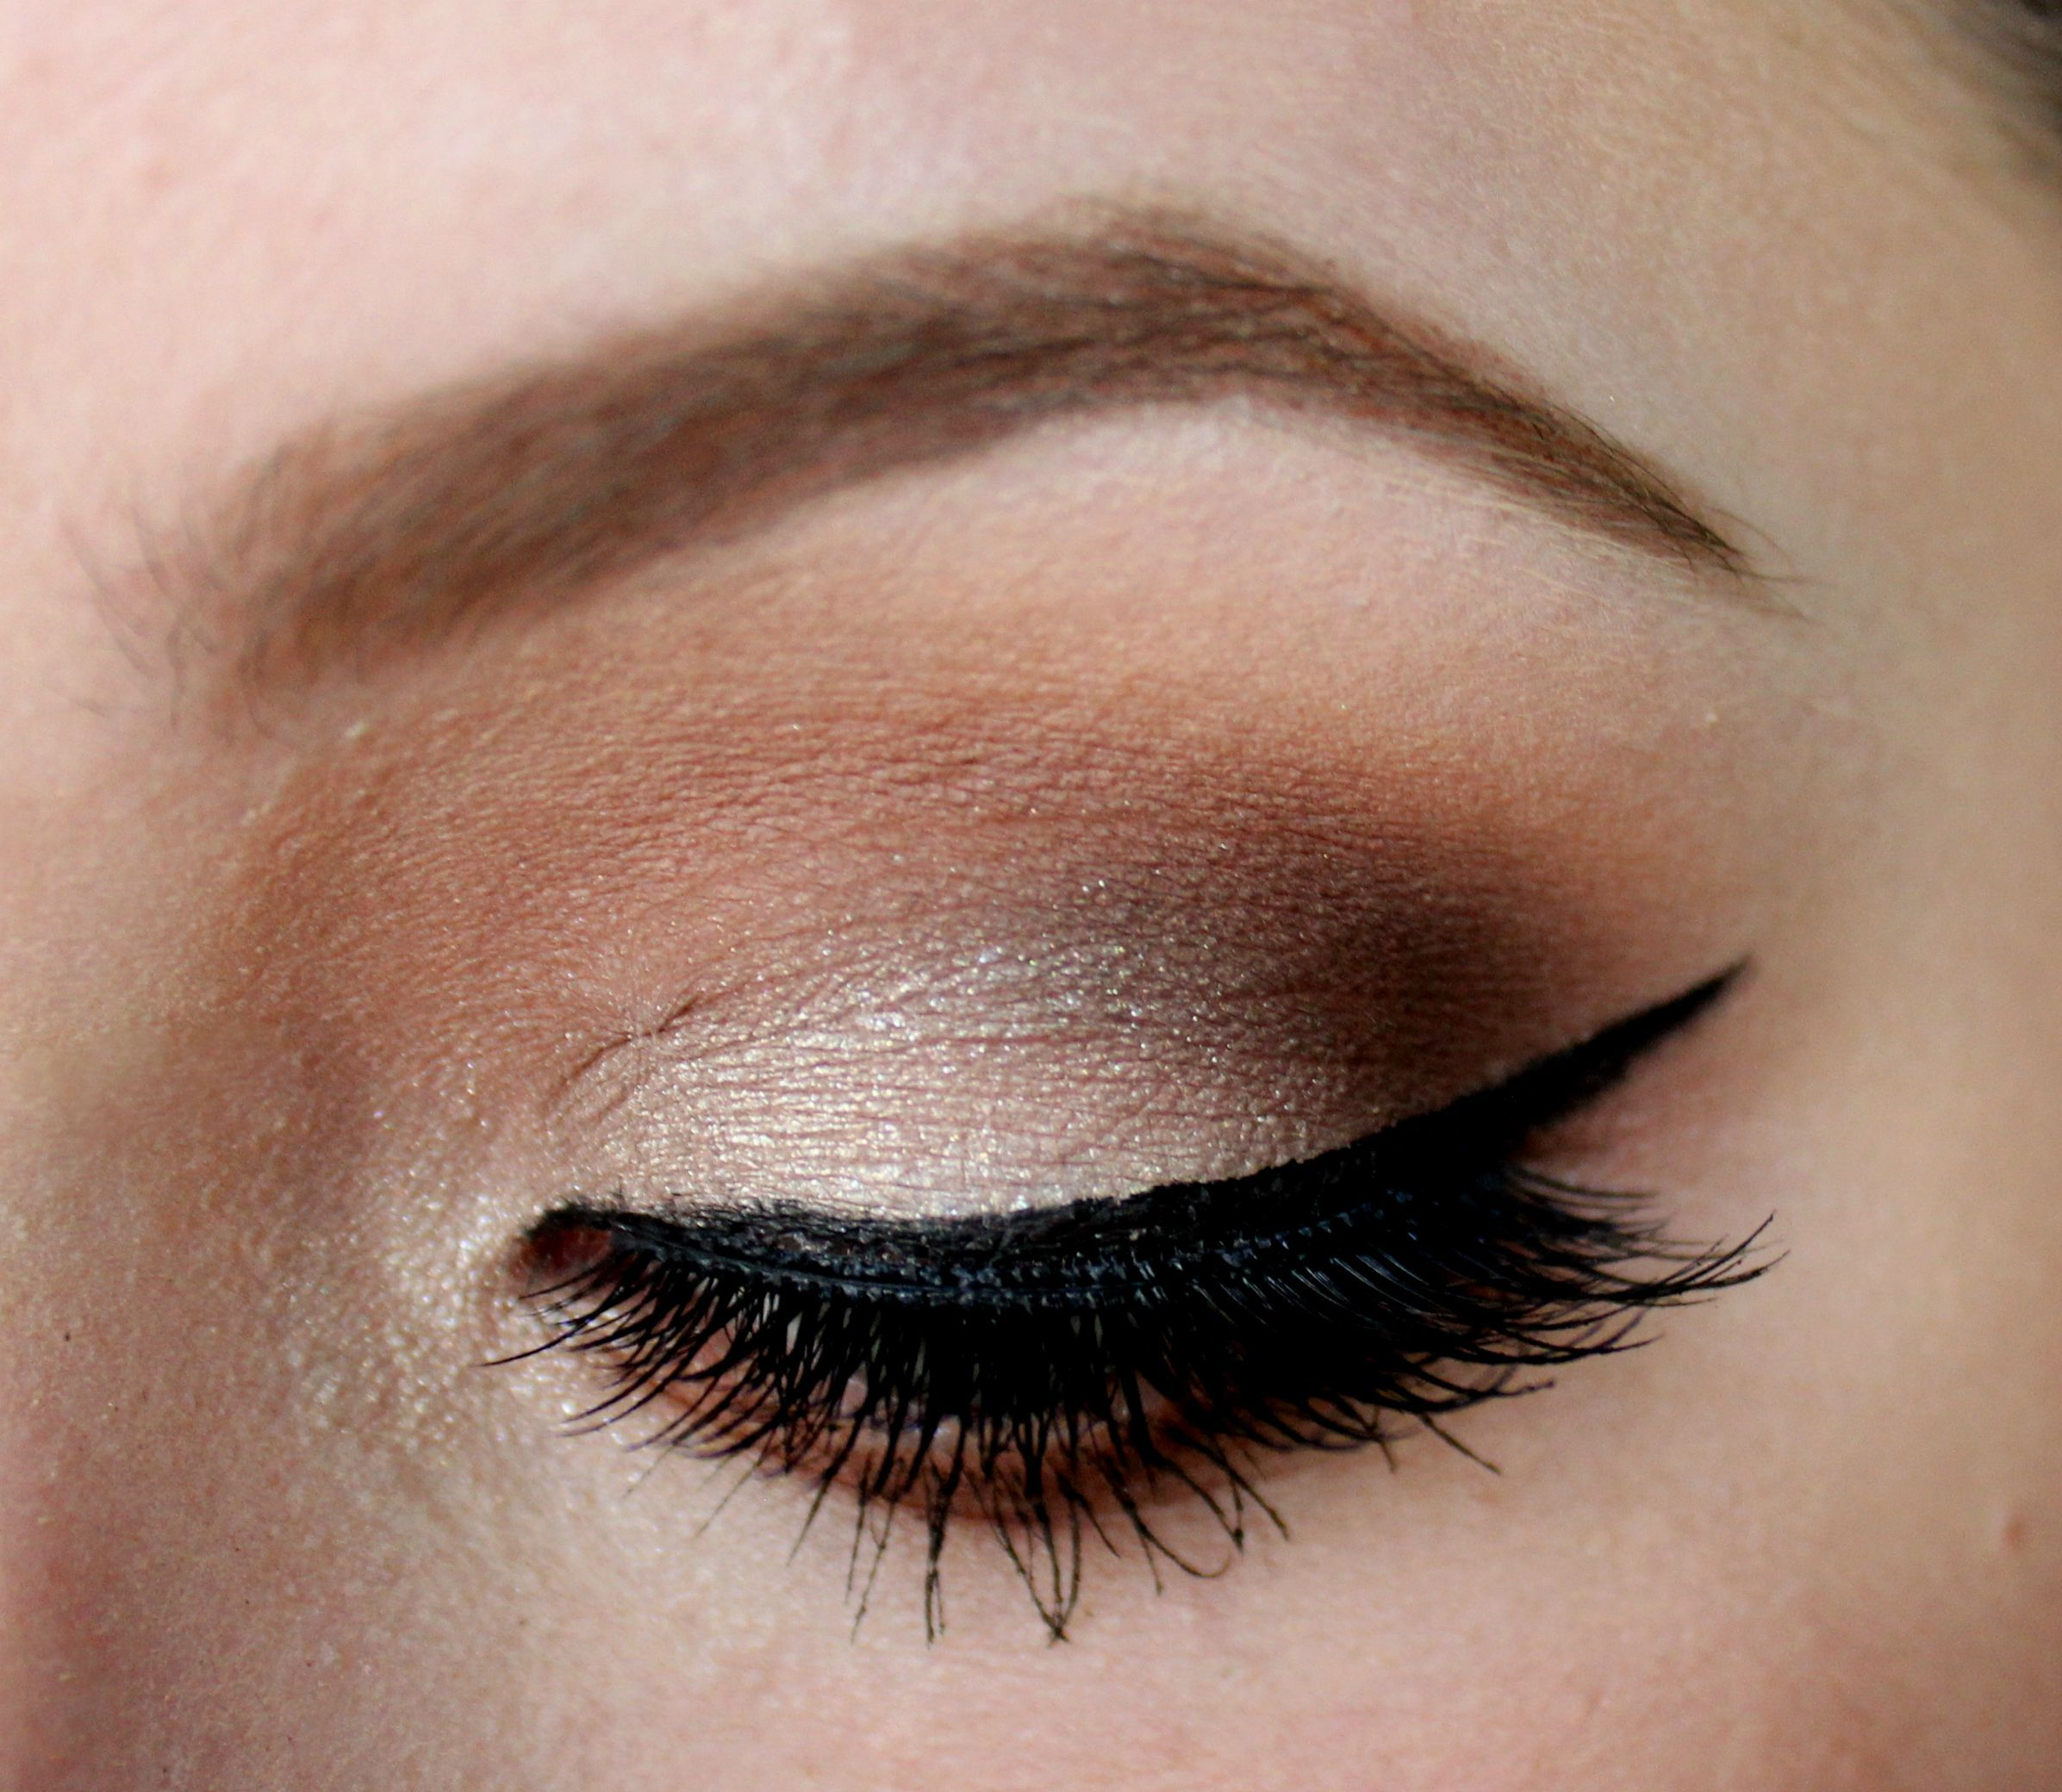 Neutral Glam FOTD Album on Imgur Colorpop eyeshadow